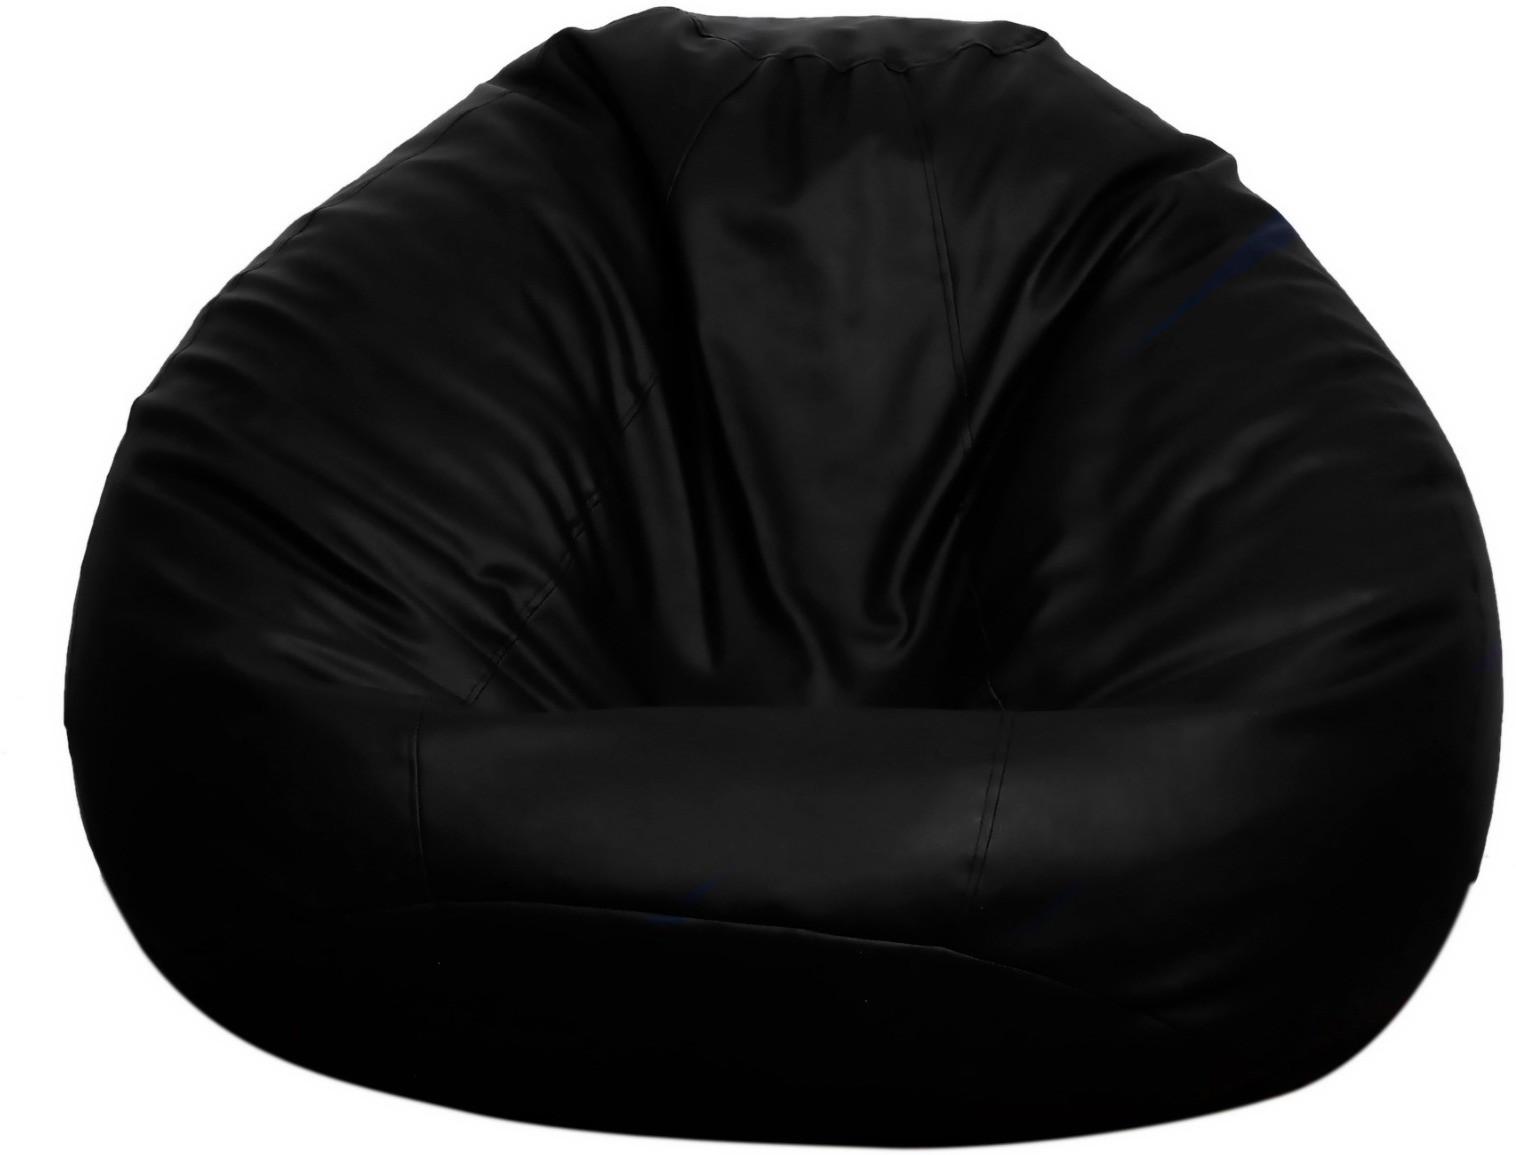 View Opulence Lounger XXXL VW17 Bean Bag  With Bean Filling(Black) Furniture (Opulence Lounger)